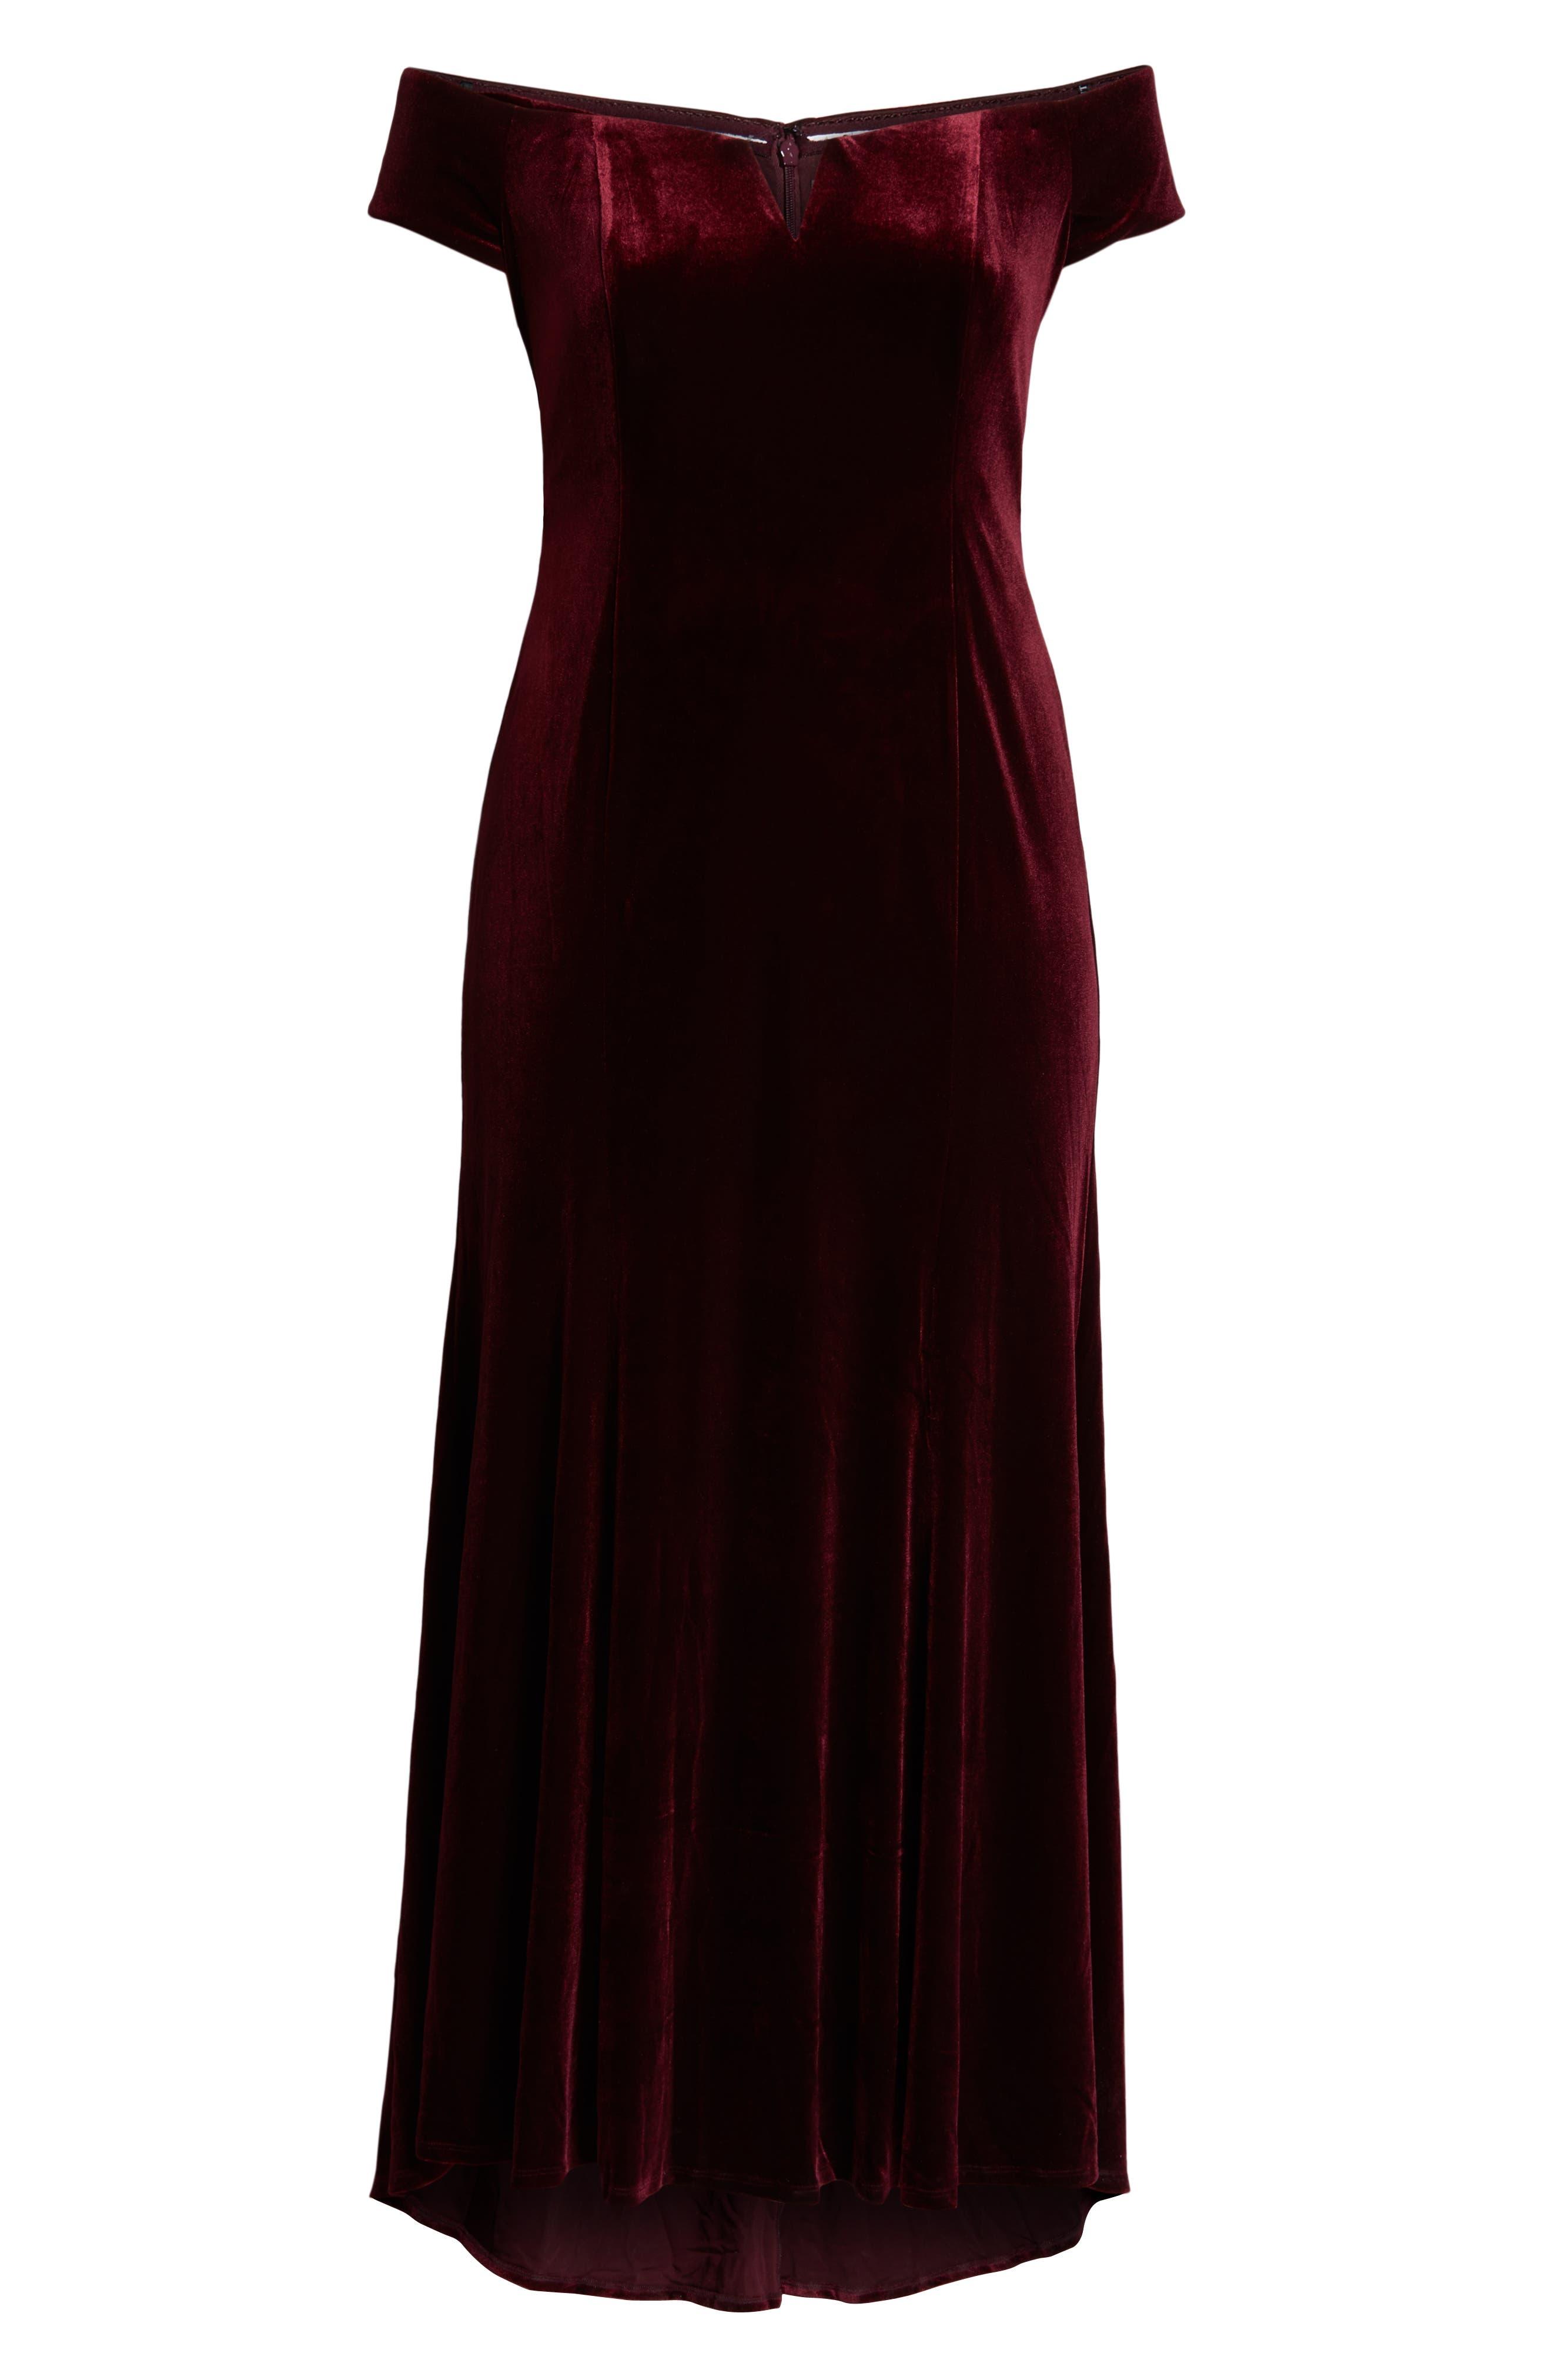 VINCE CAMUTO, Notch Neck Velvet Off the Shoulder Gown, Alternate thumbnail 7, color, 930